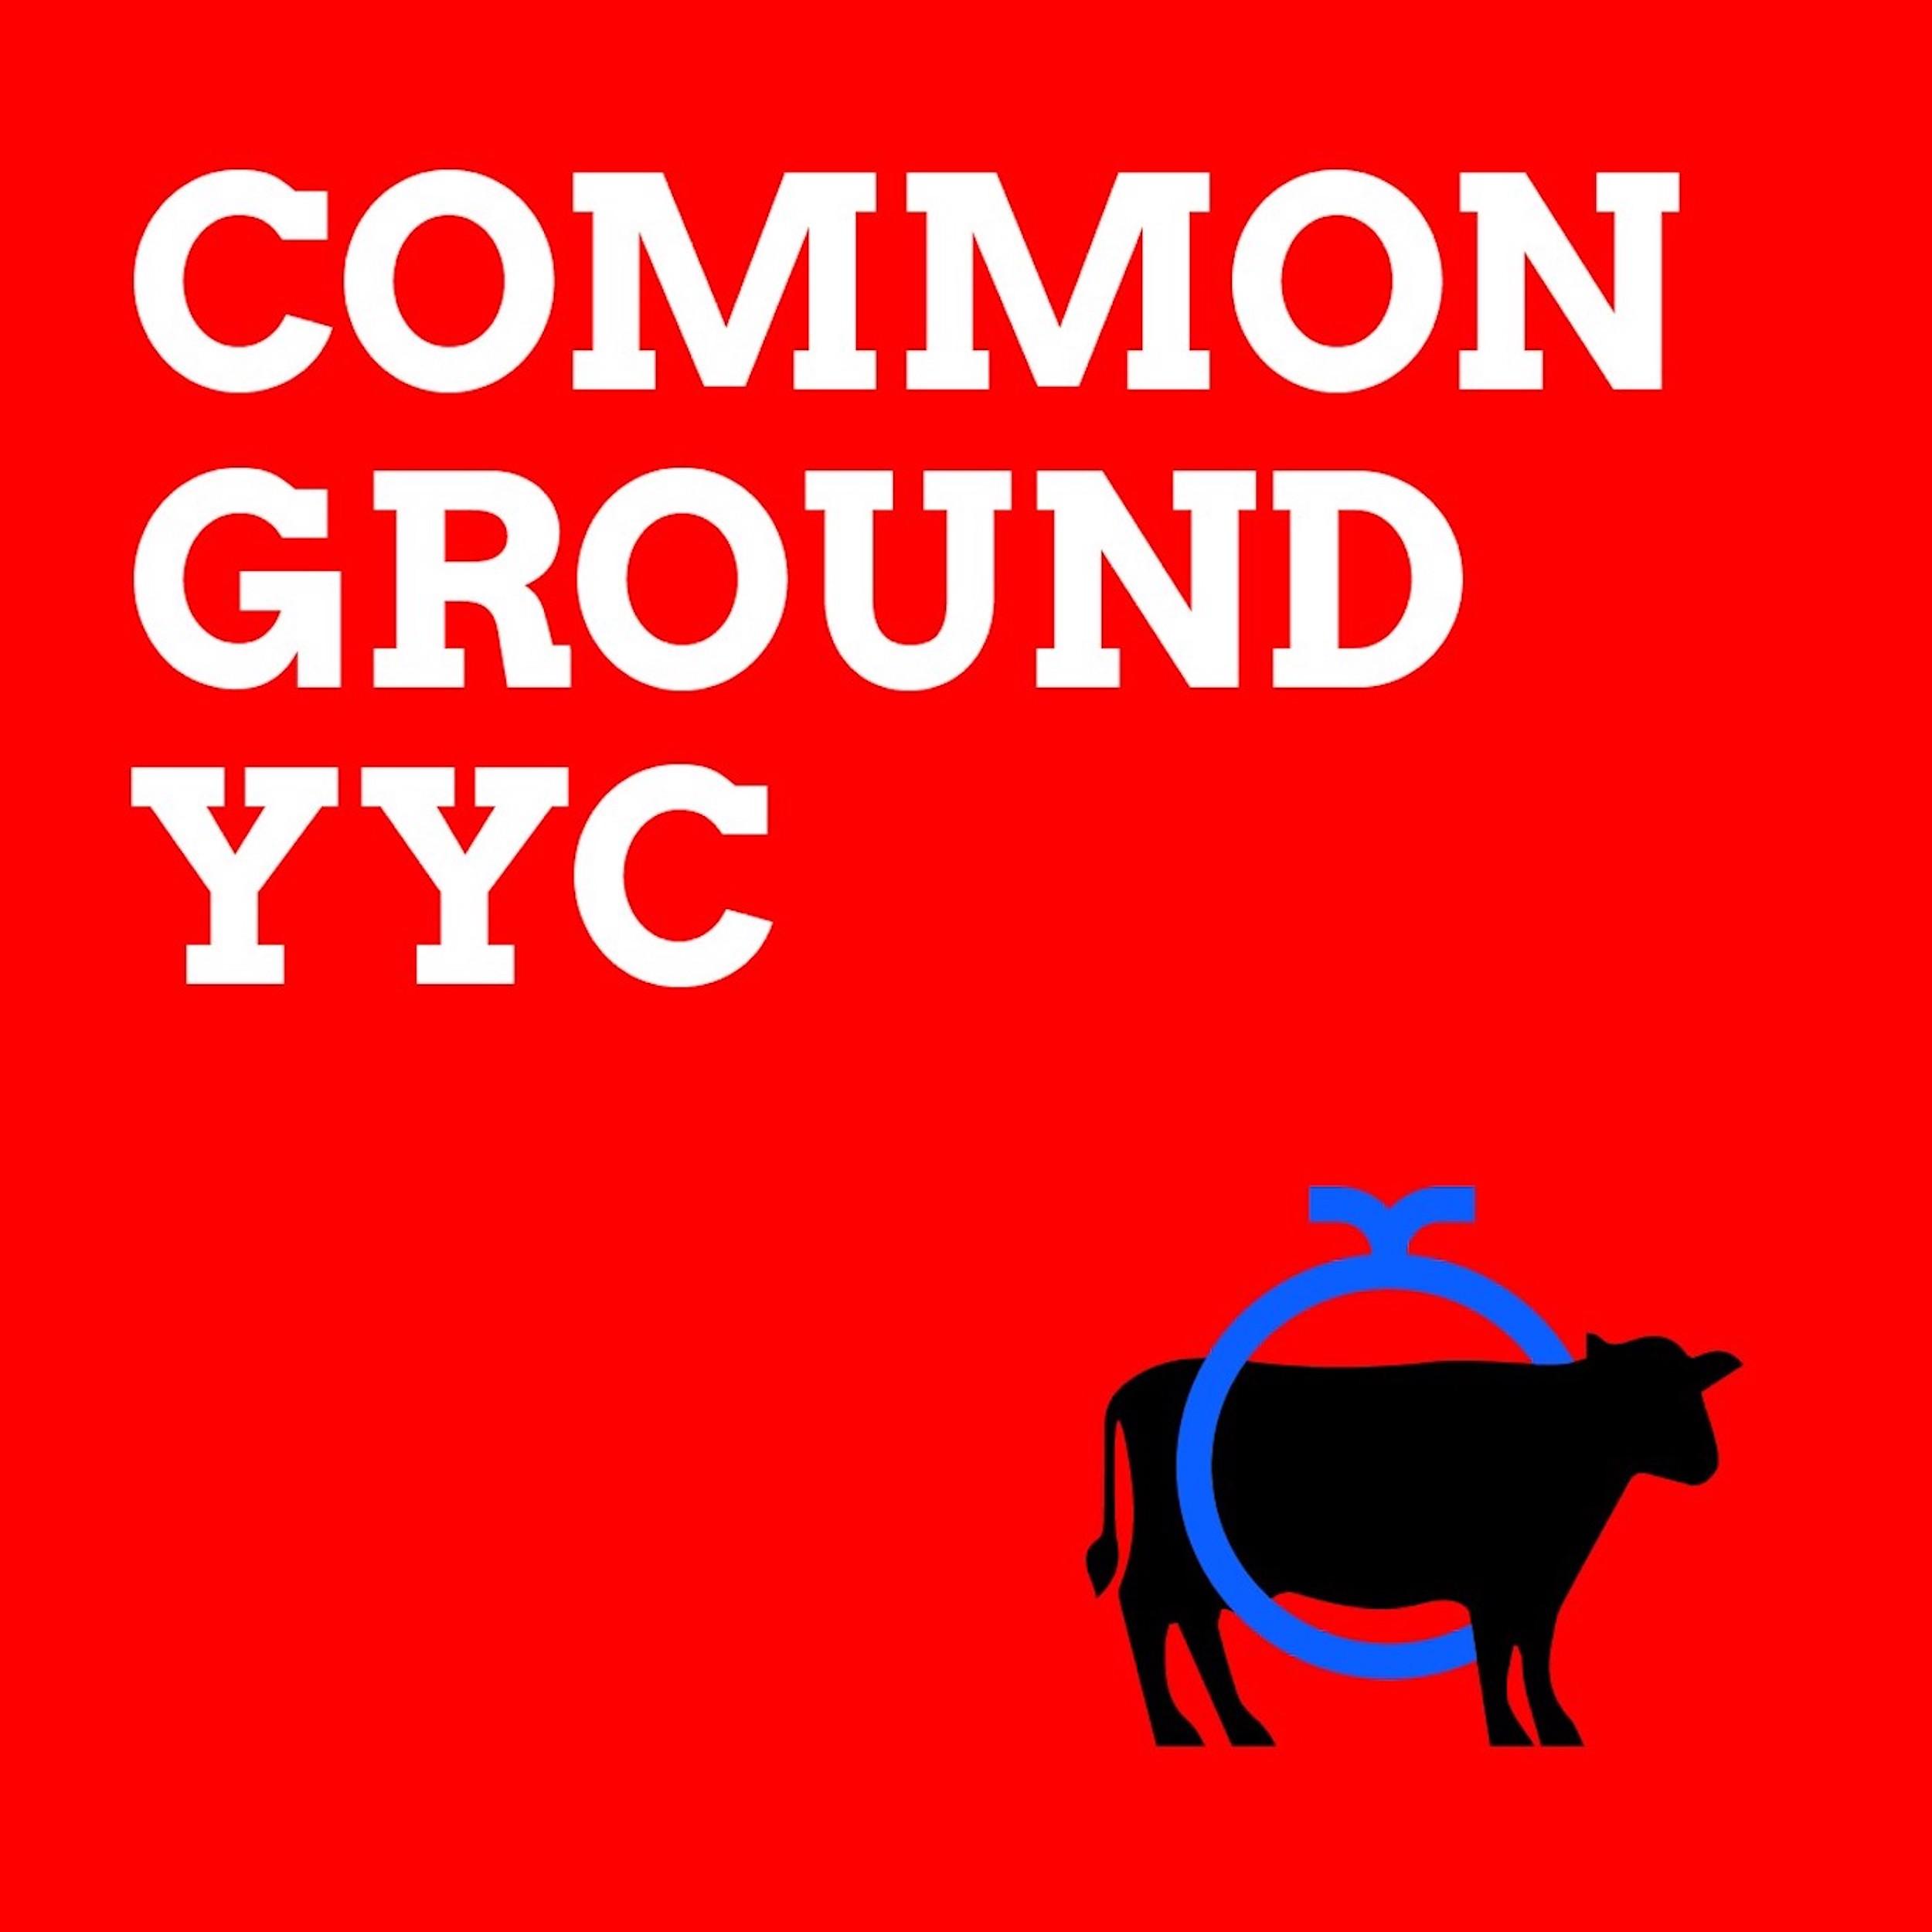 Common Ground YYC – LiveWire Calgary